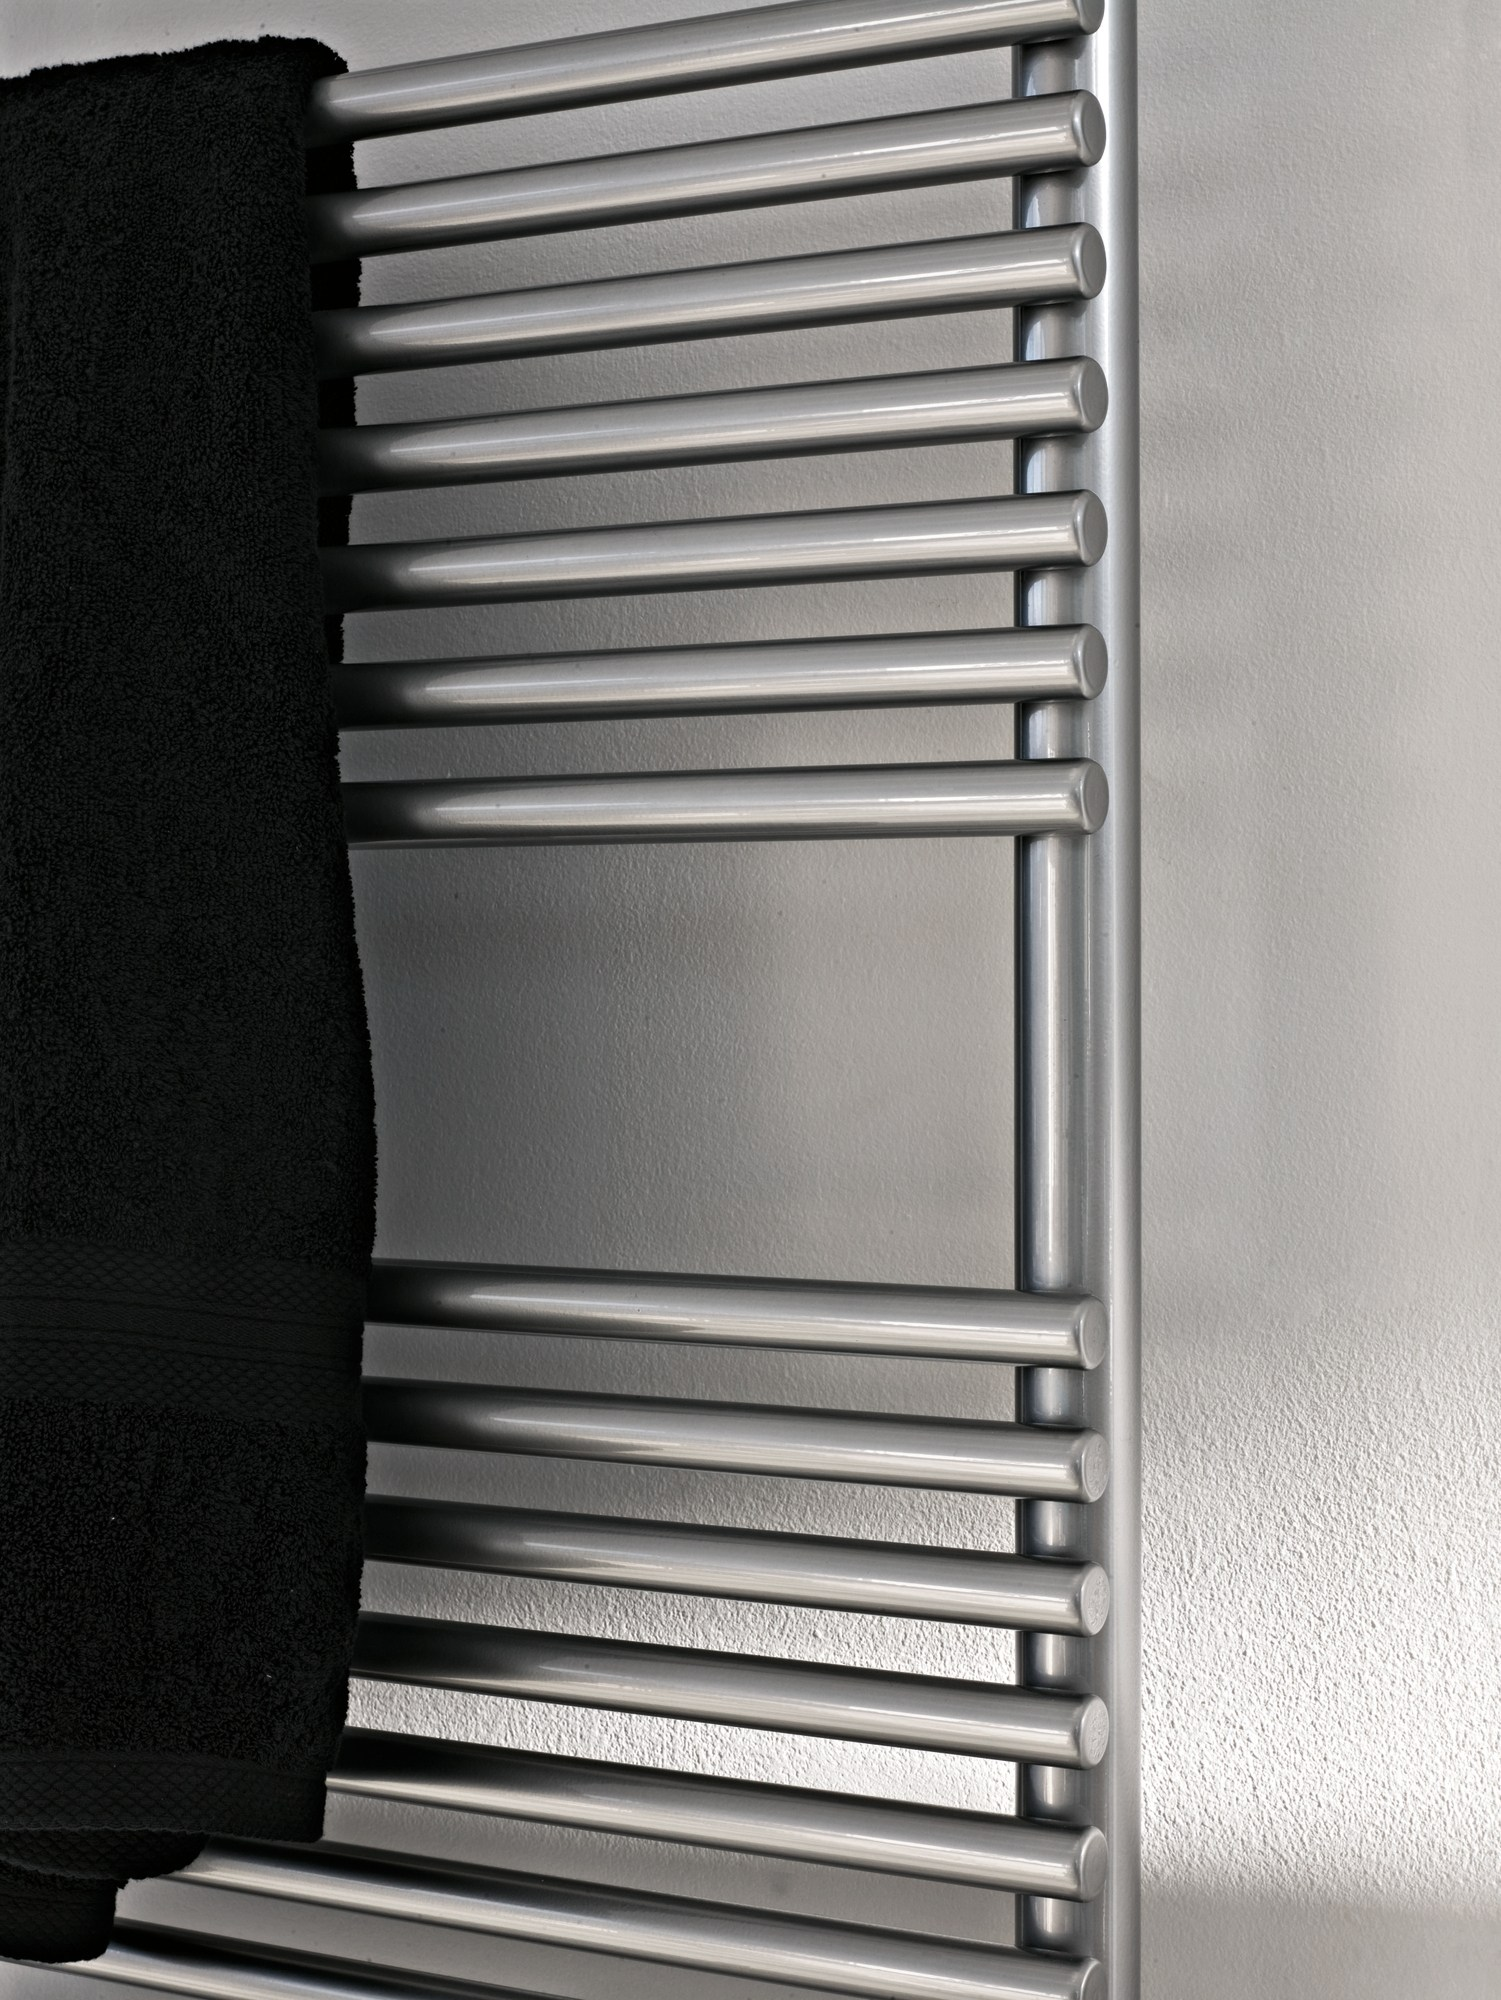 S che serviettes vertical mural basics 20 by tubes radiatori - Seche serviette mural ...